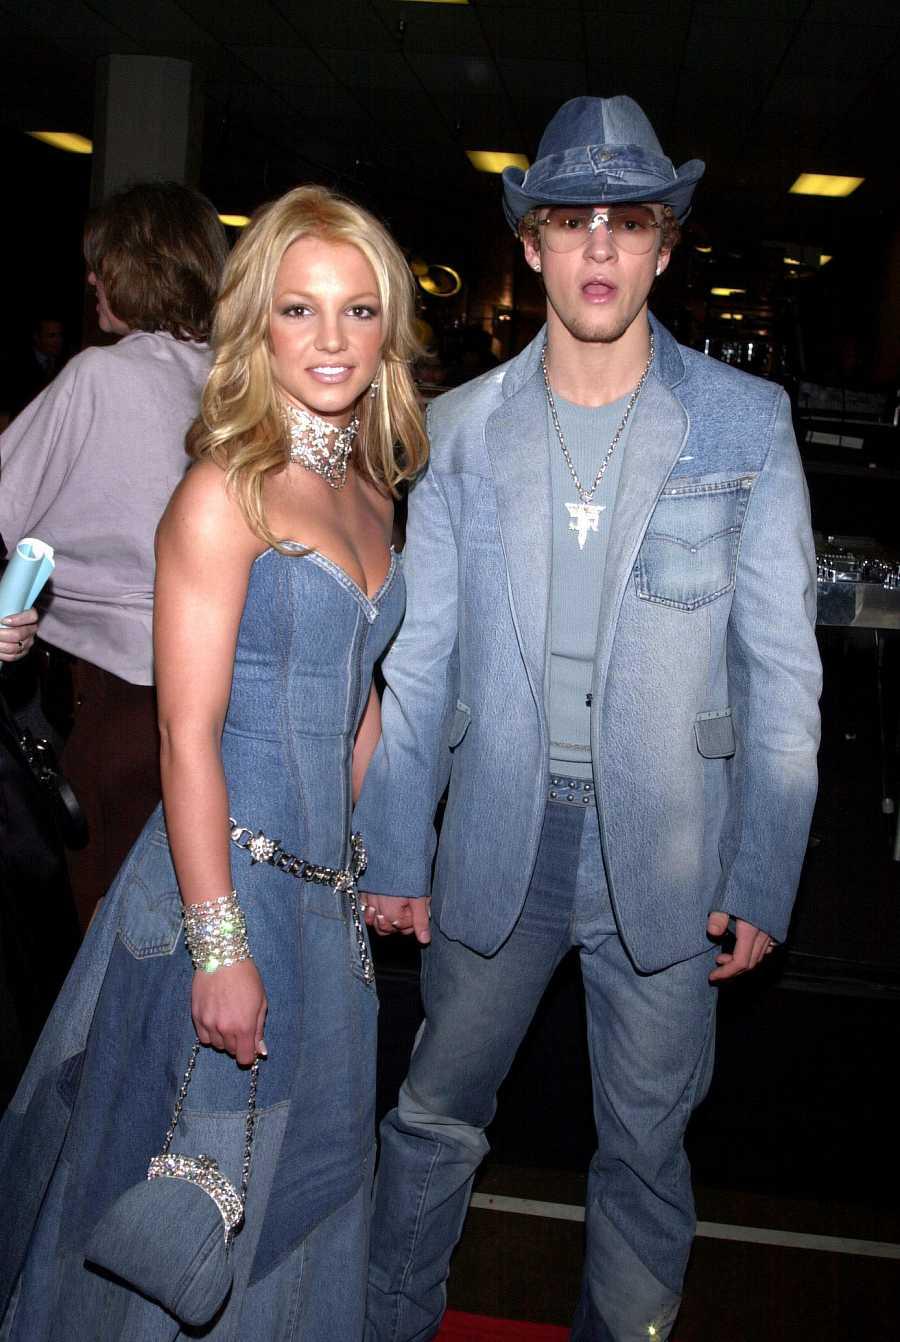 Britney Spears junto a Justin Timberlake en los Music Awards en 2001